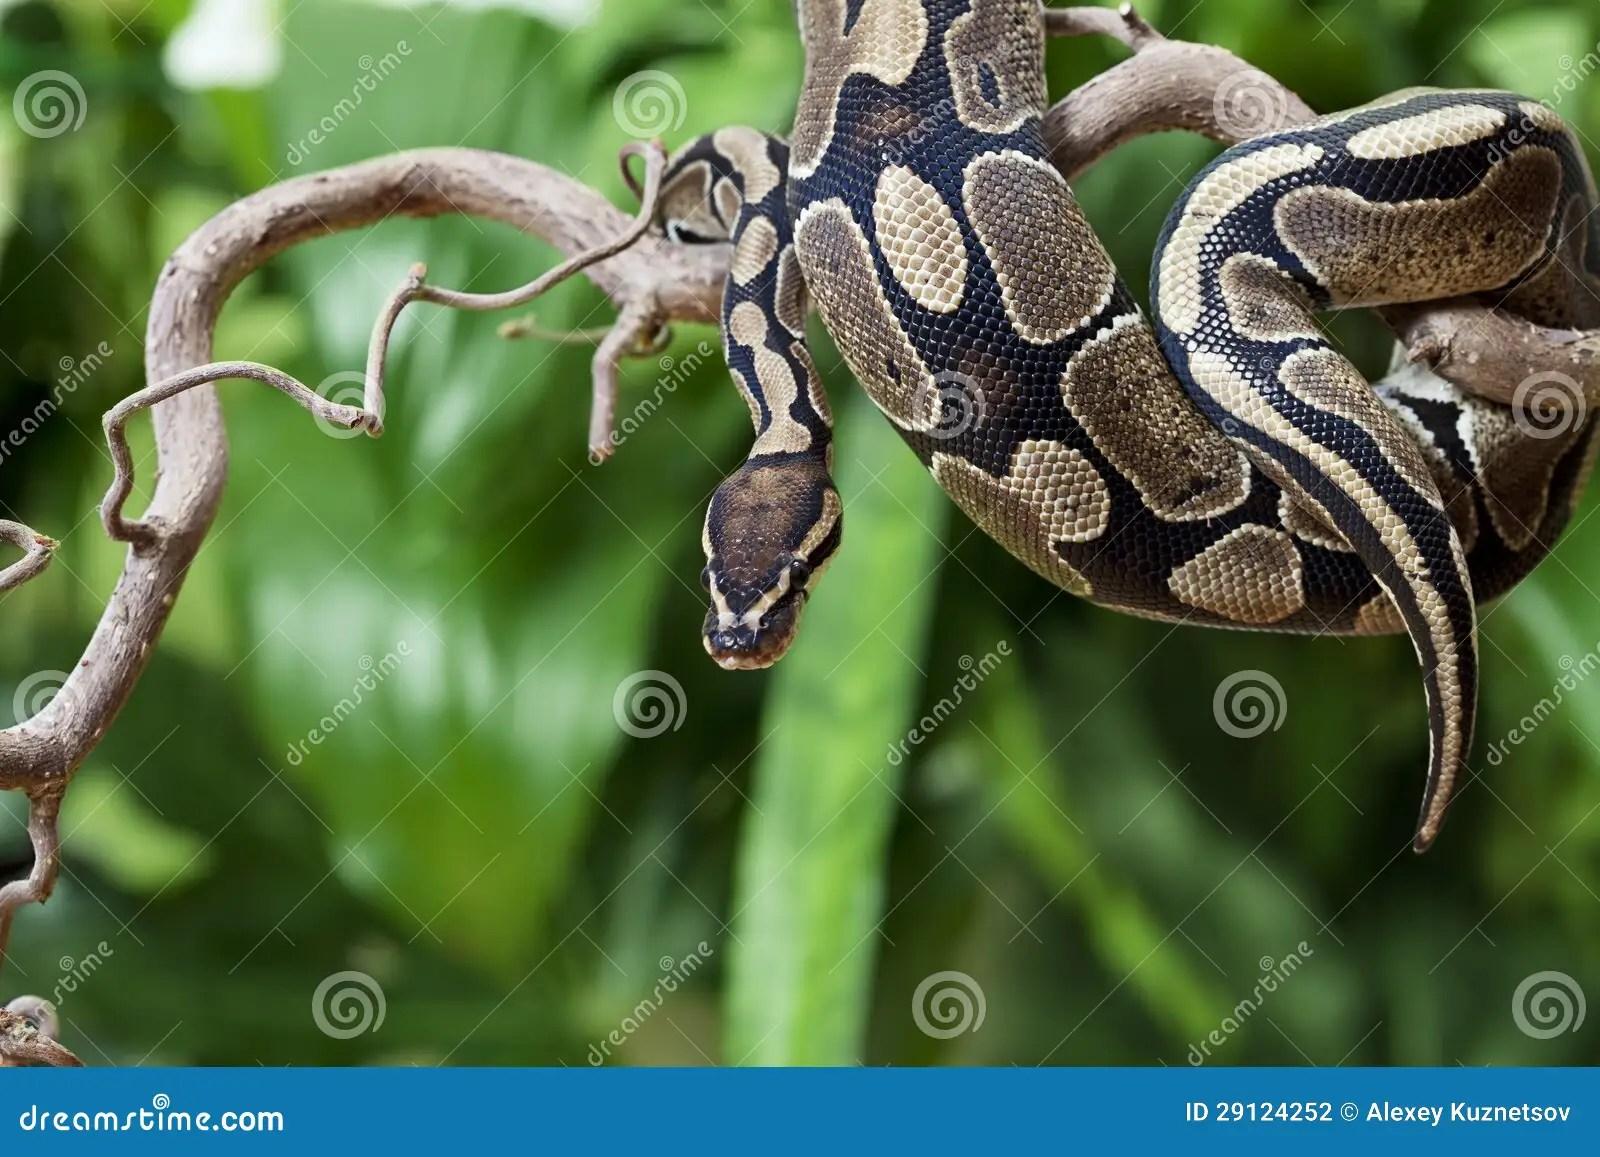 Royal Python Snake On A Wooden Branch Stock Photography